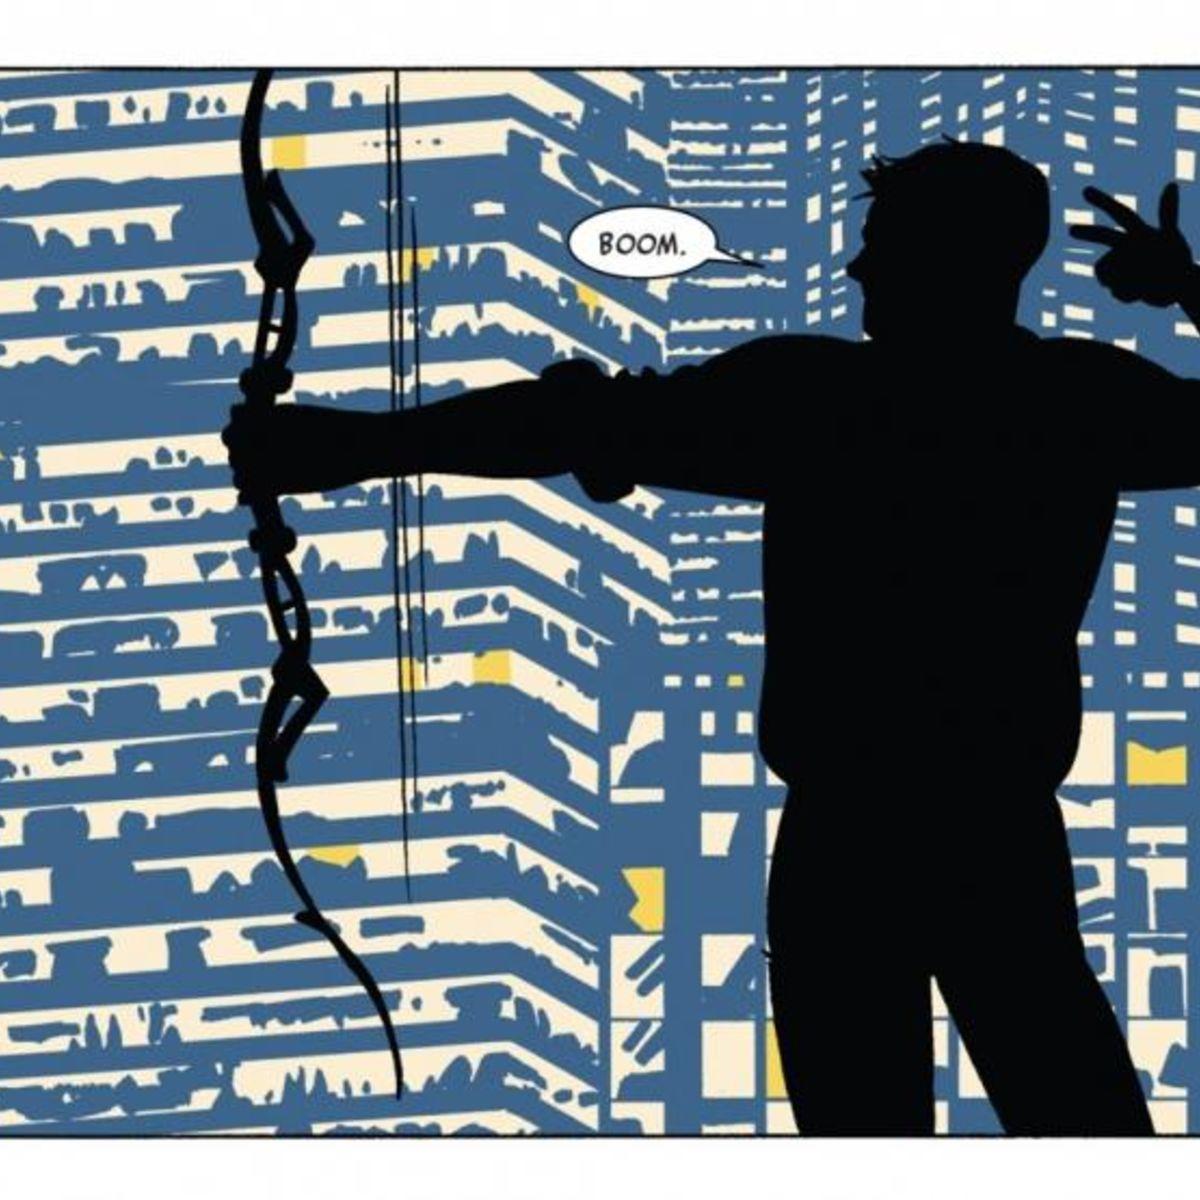 HawkeyeHeader.jpg